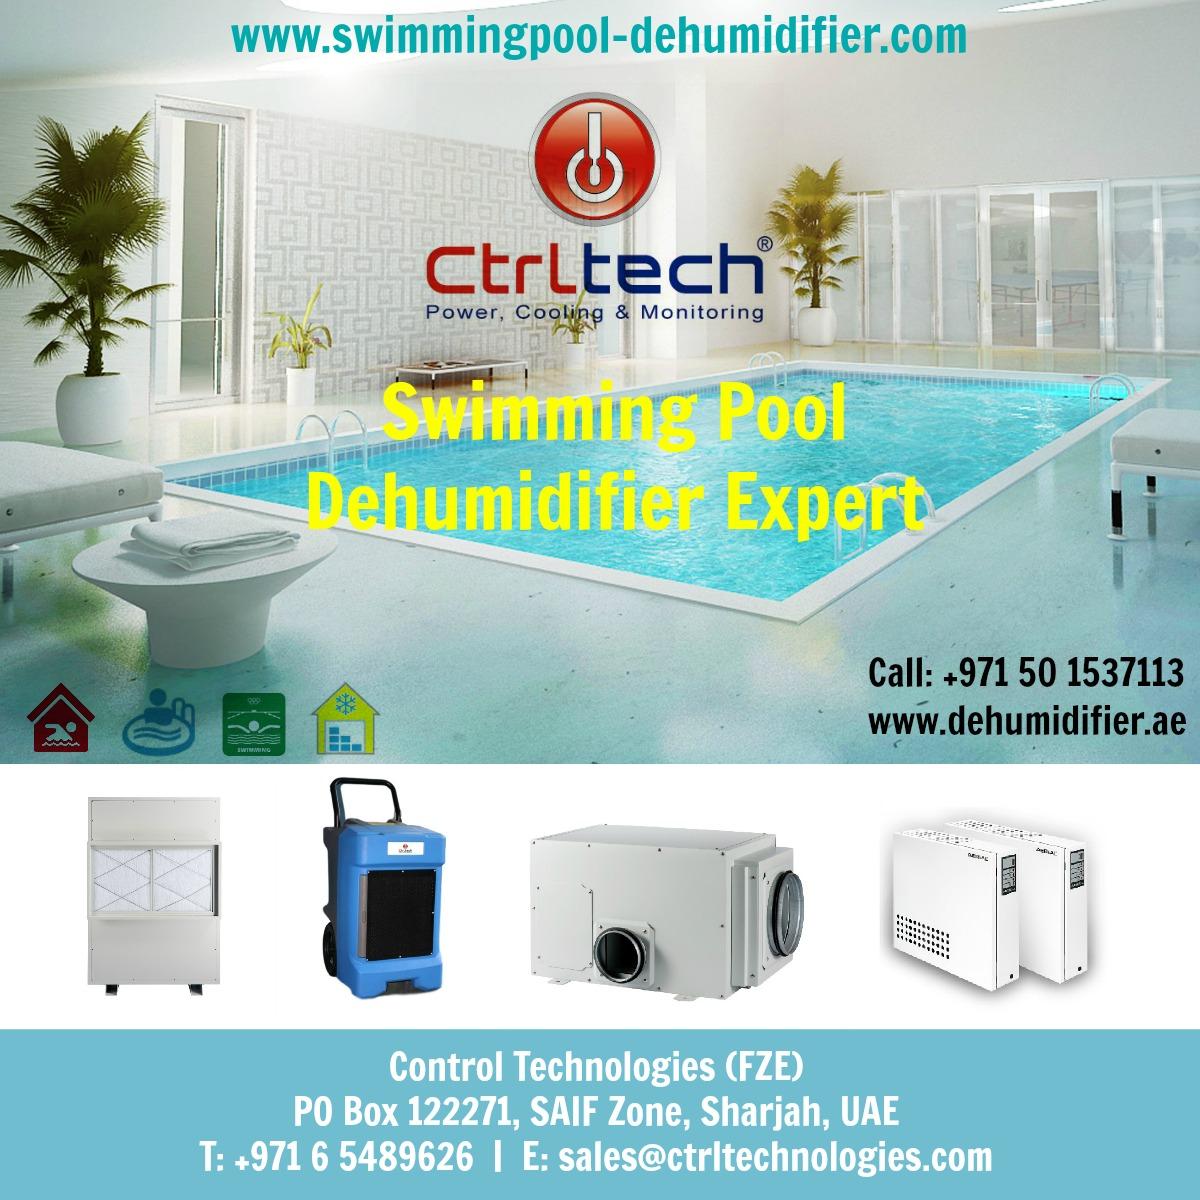 Swimming pool Dehumidifier supplier in UAE, Saudi Arabia ...